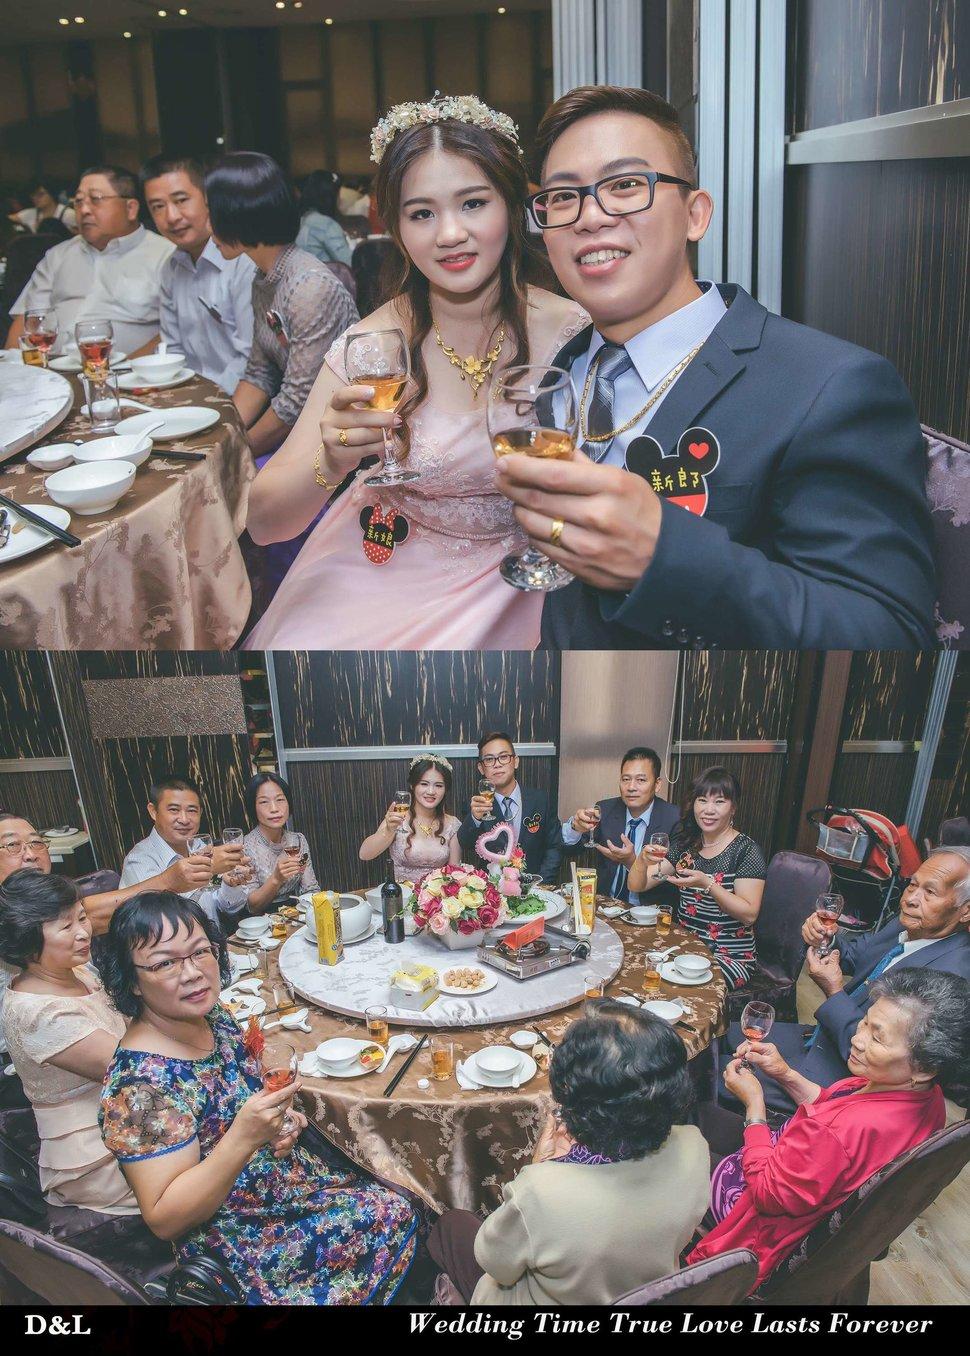 28 - D&L 婚禮事務 · 婚禮婚紗攝影 - 結婚吧